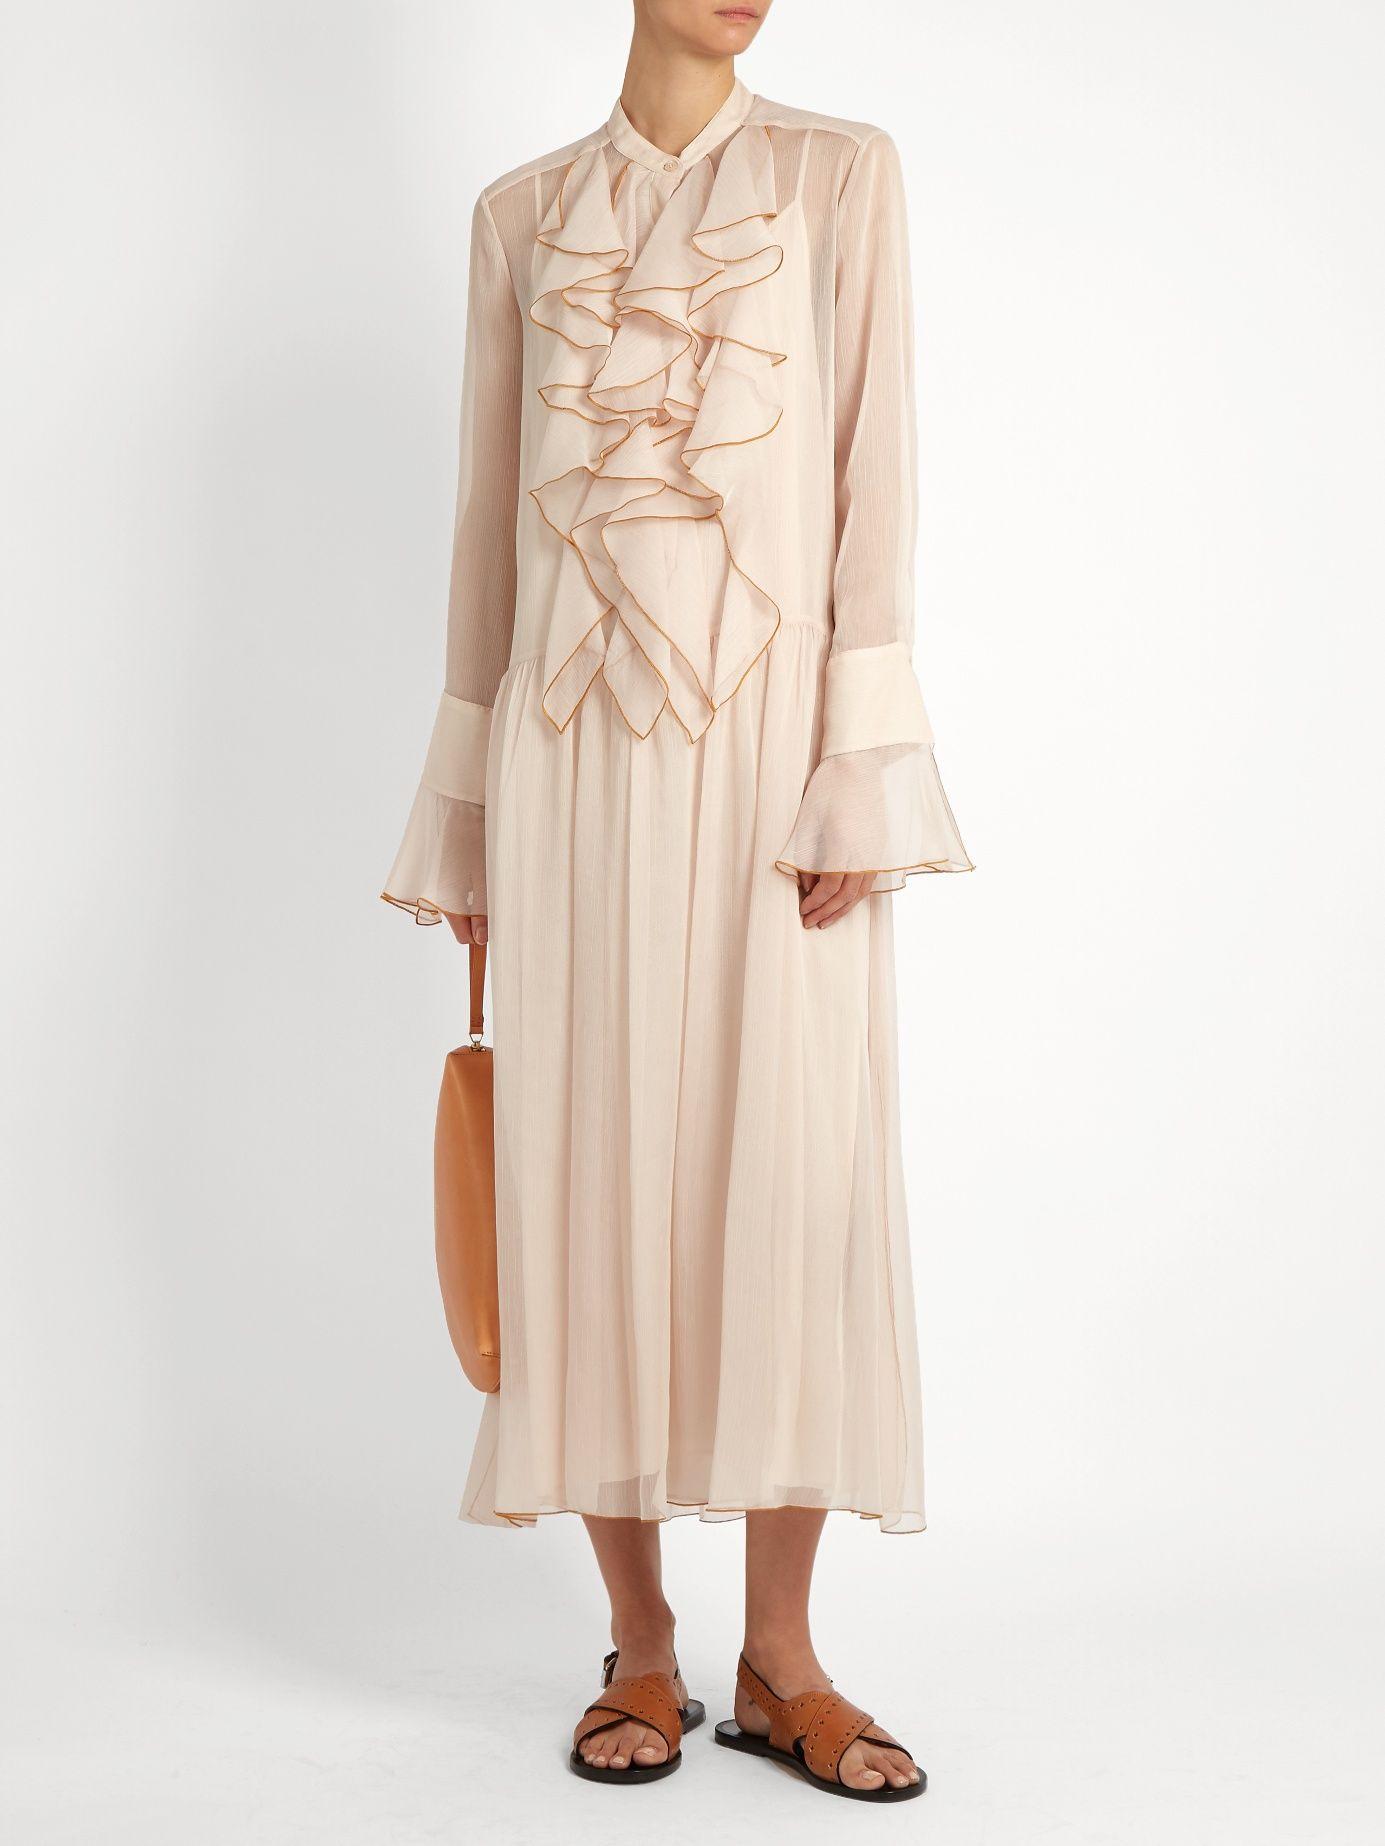 Chloé Ruffle-trimmed dress yPbmSj